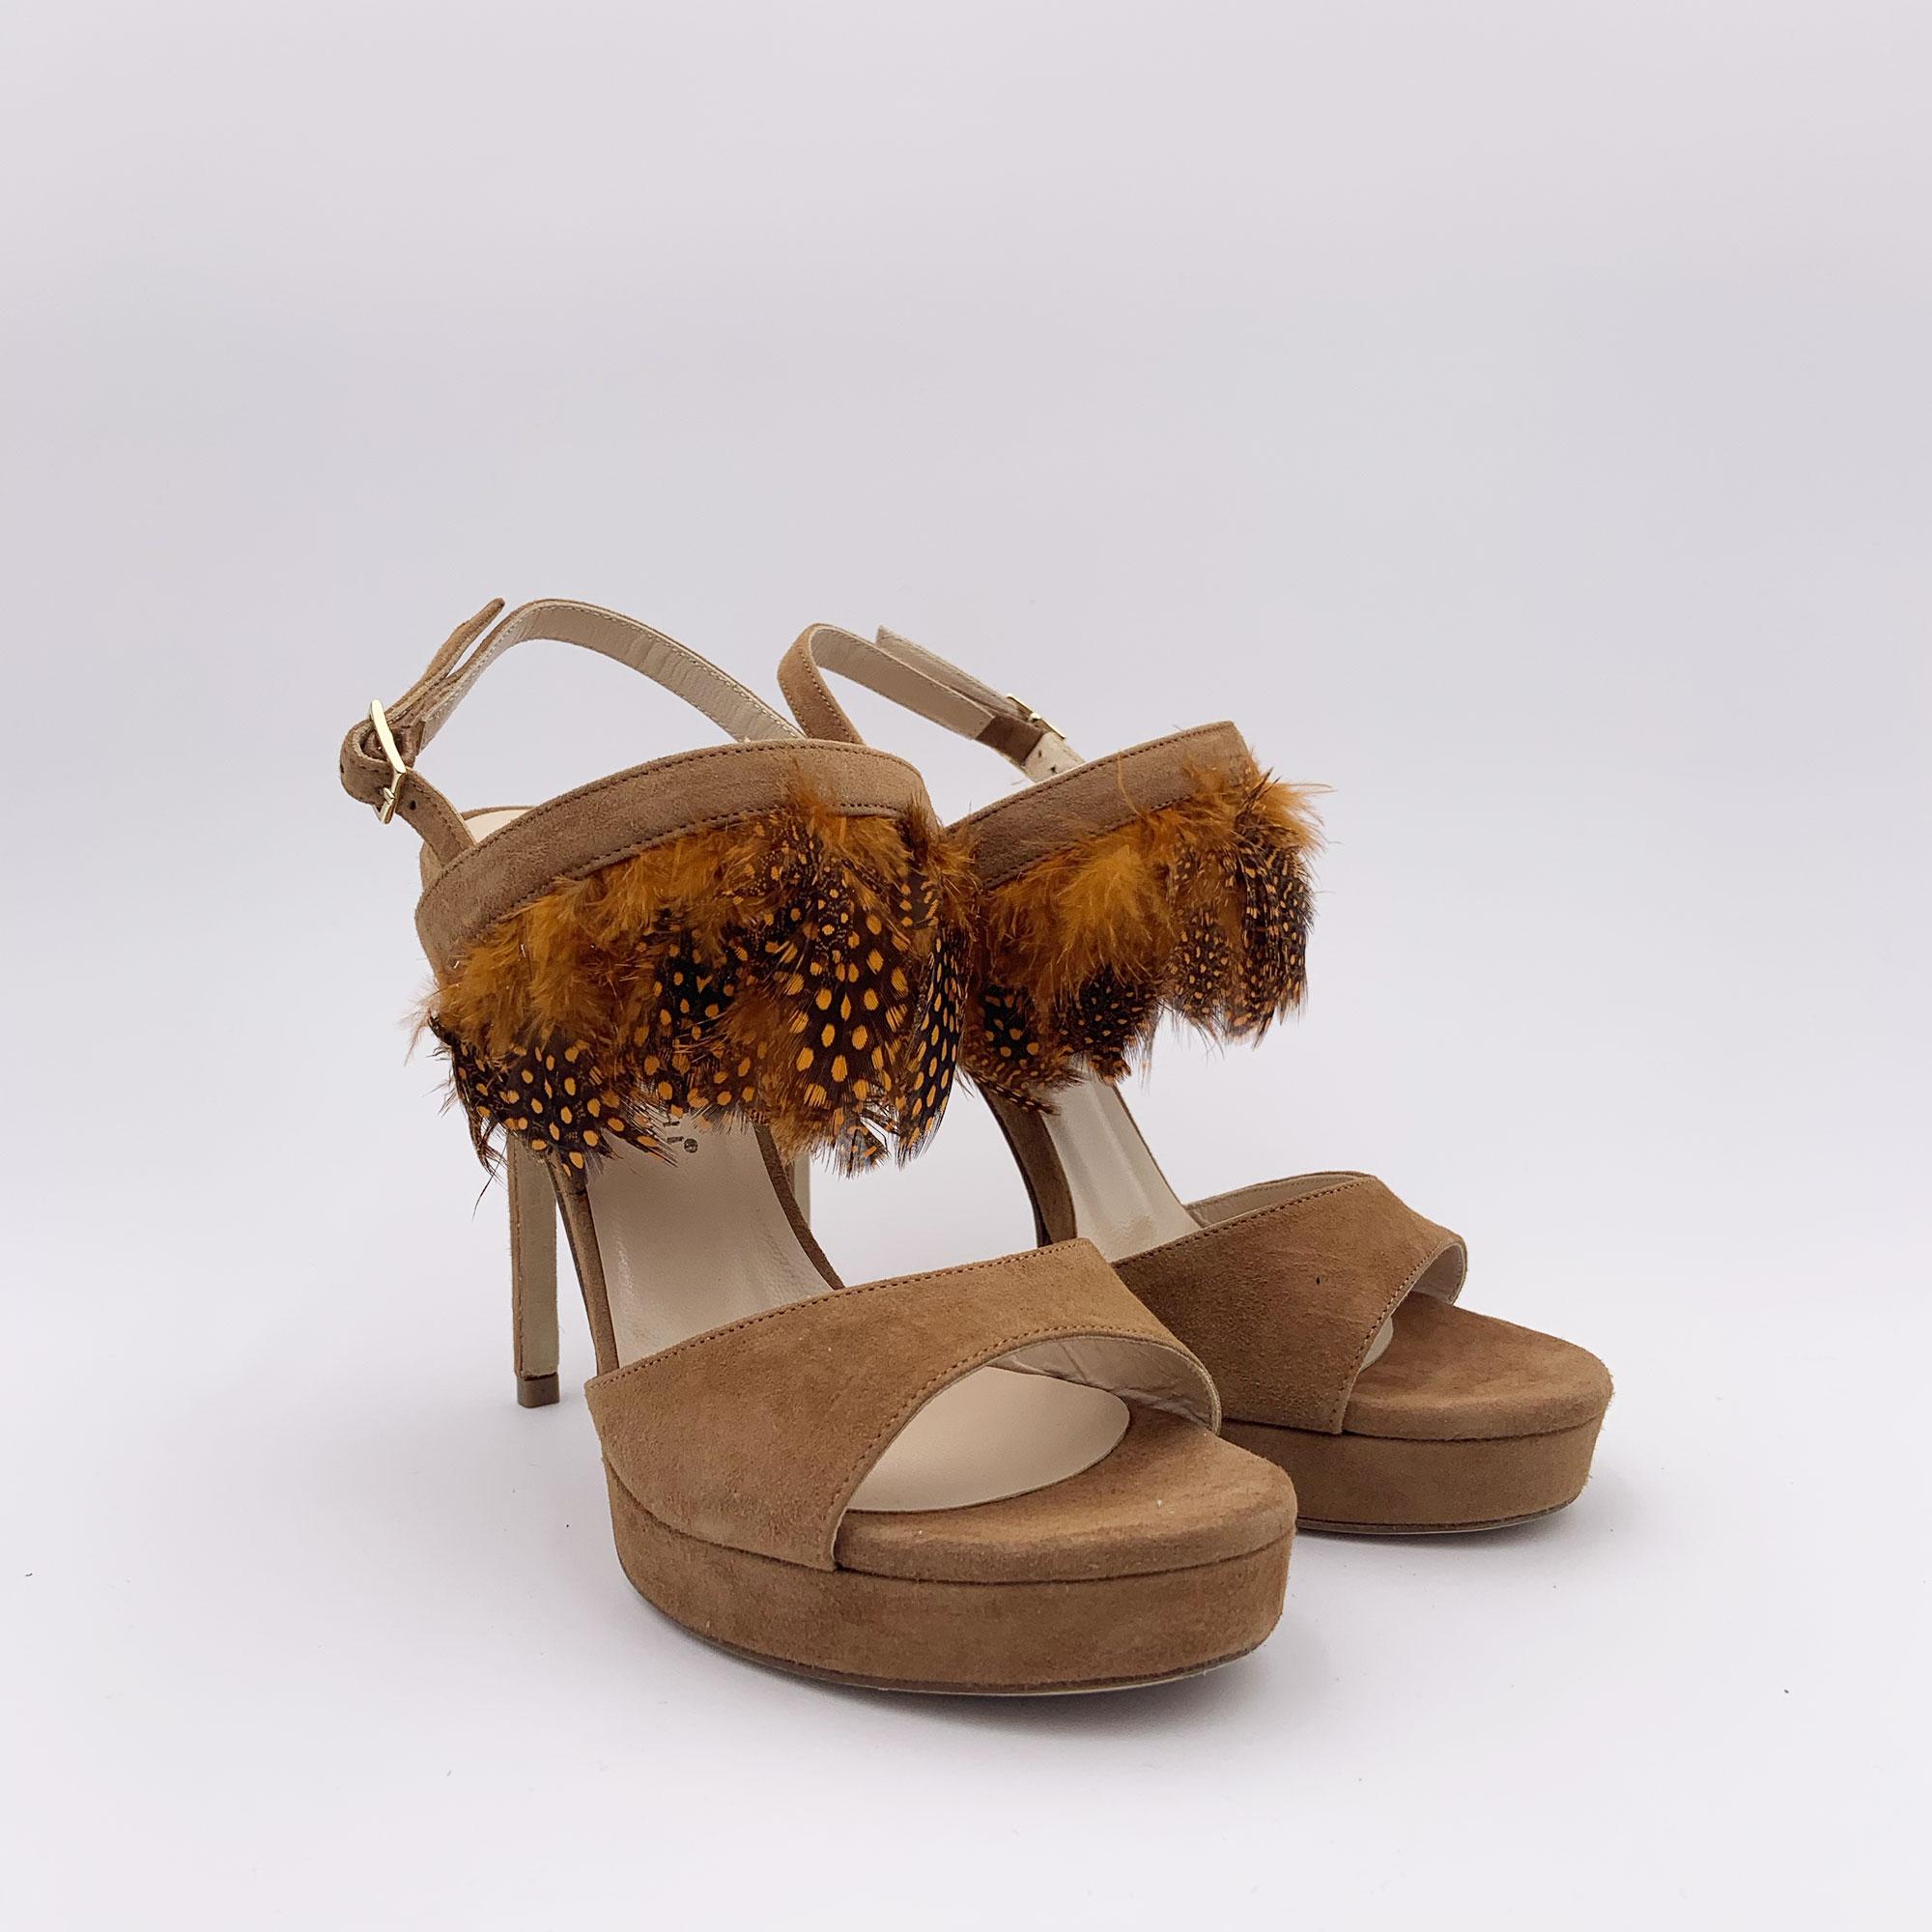 Sandalo tacco piume - Cognac